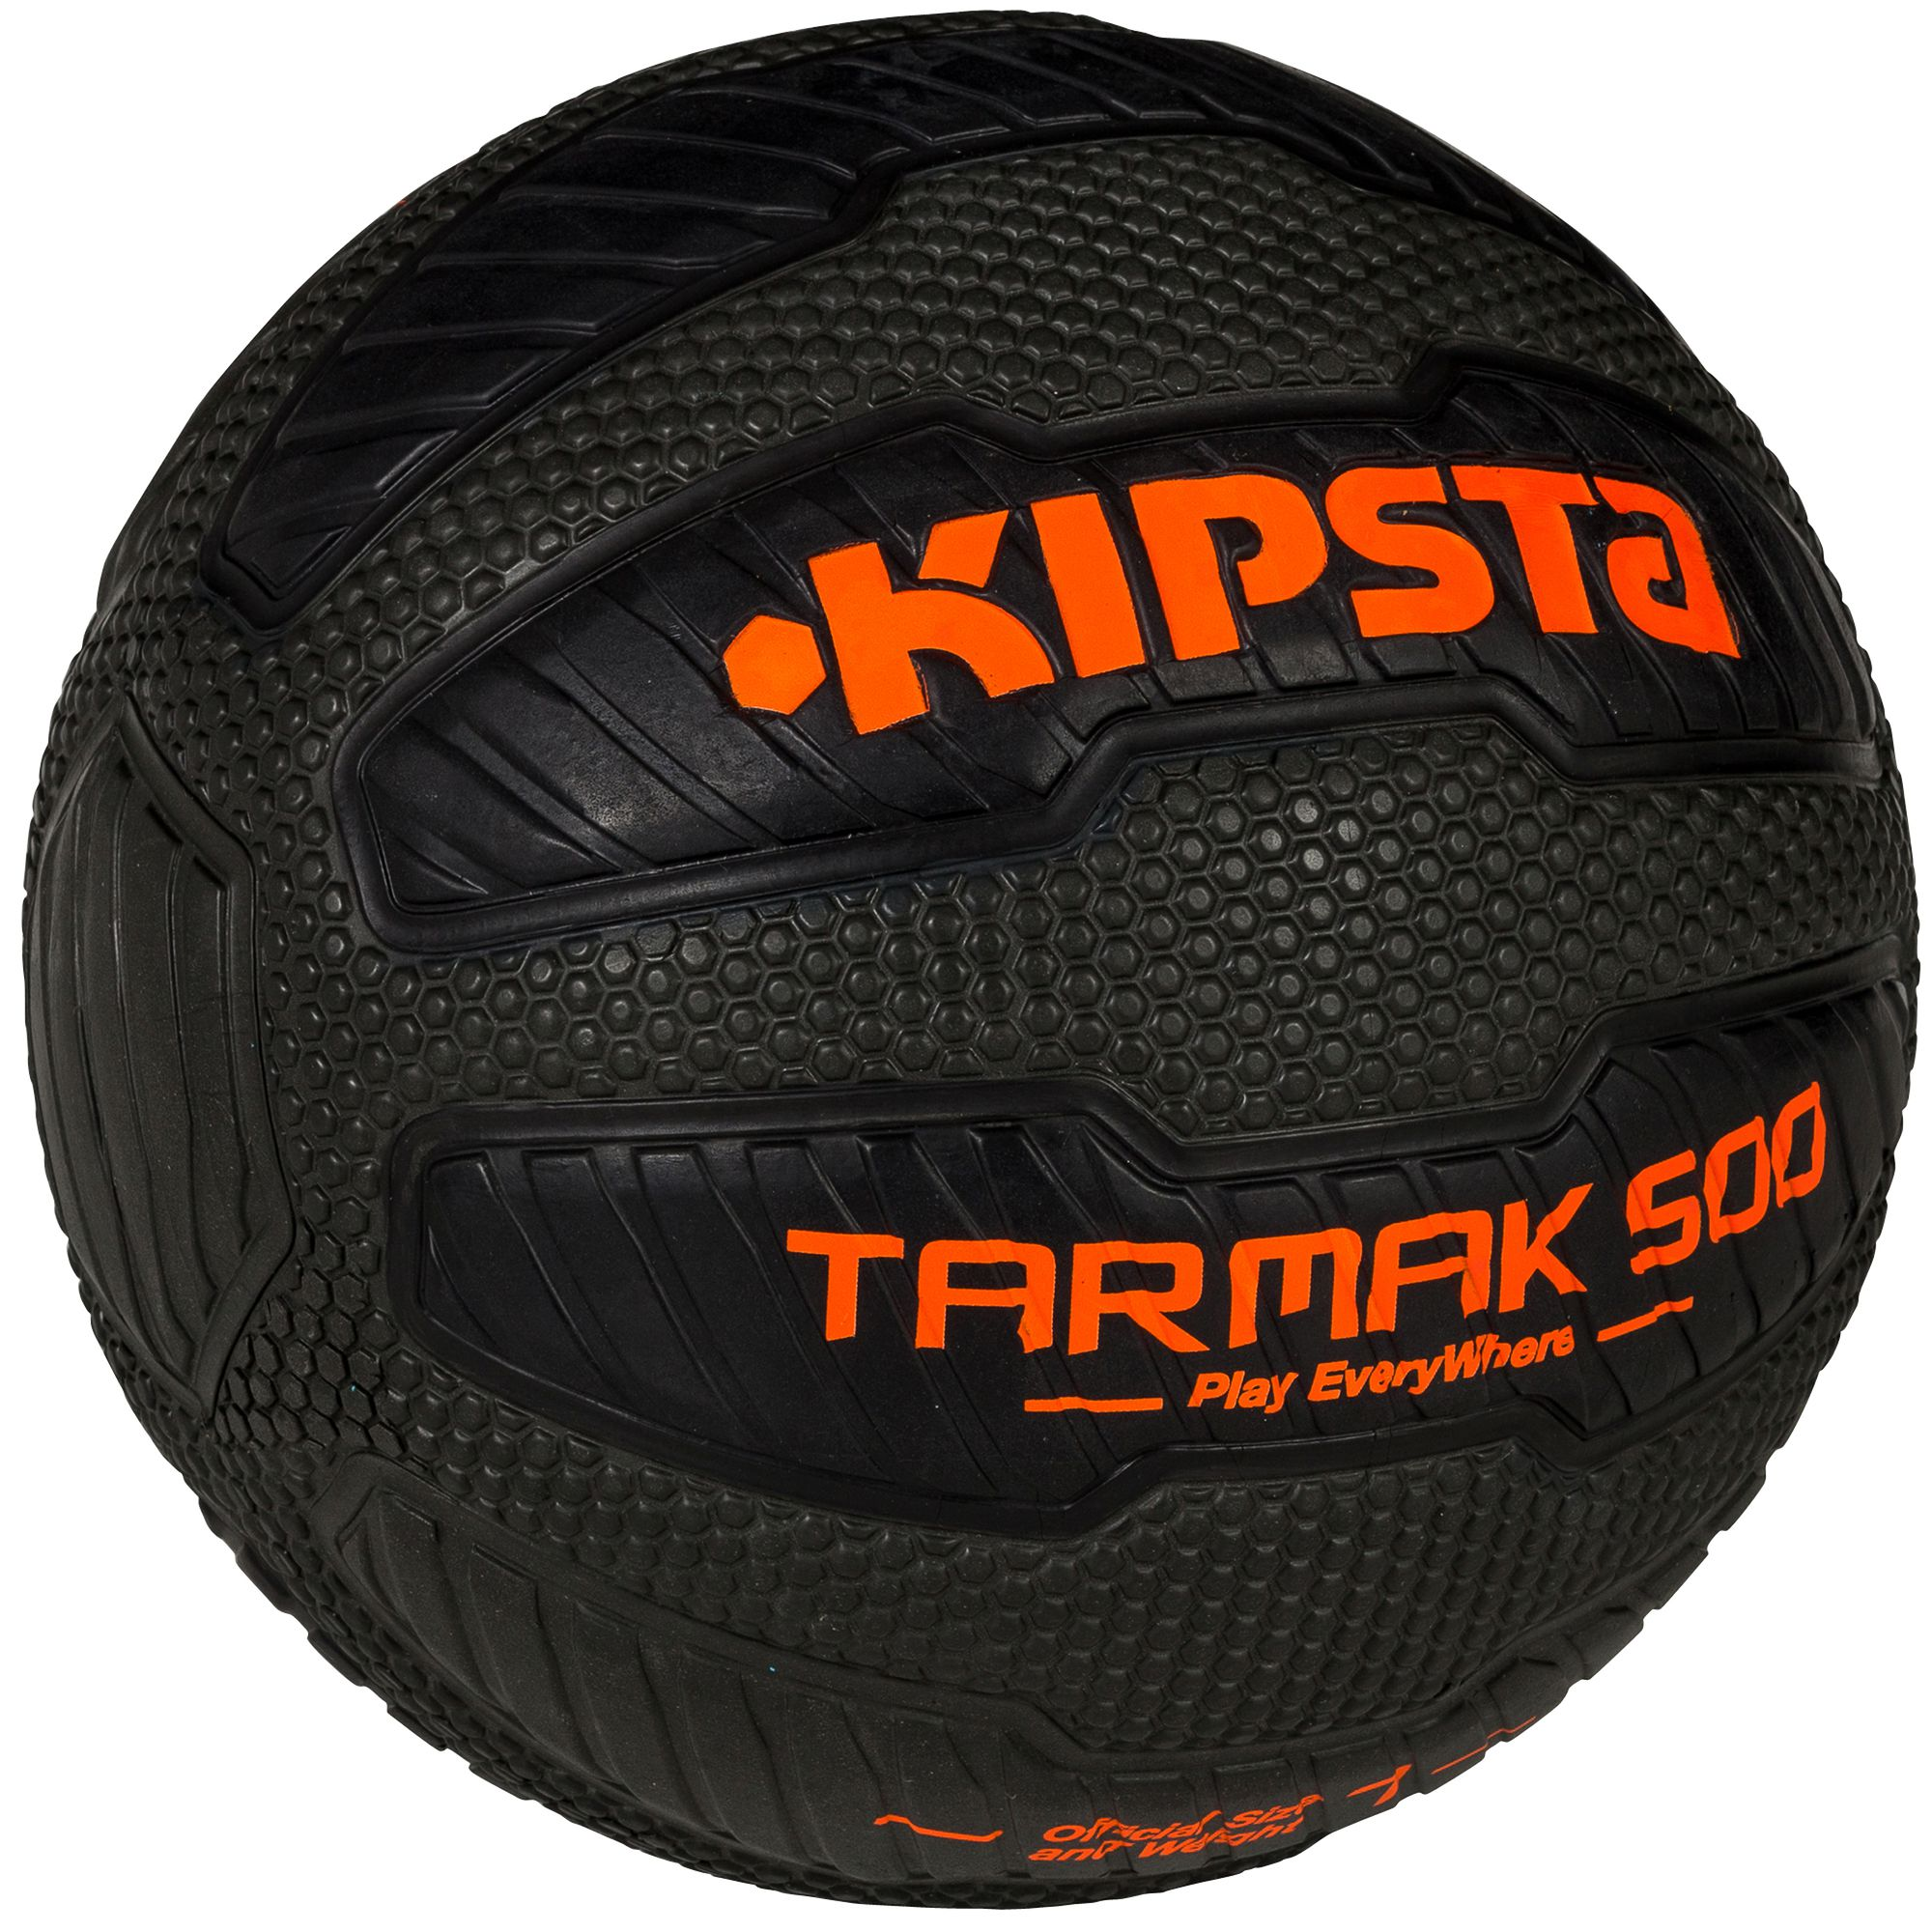 Ballon basketball adulte Tarmak 500 Magic Jam taille 7 noir